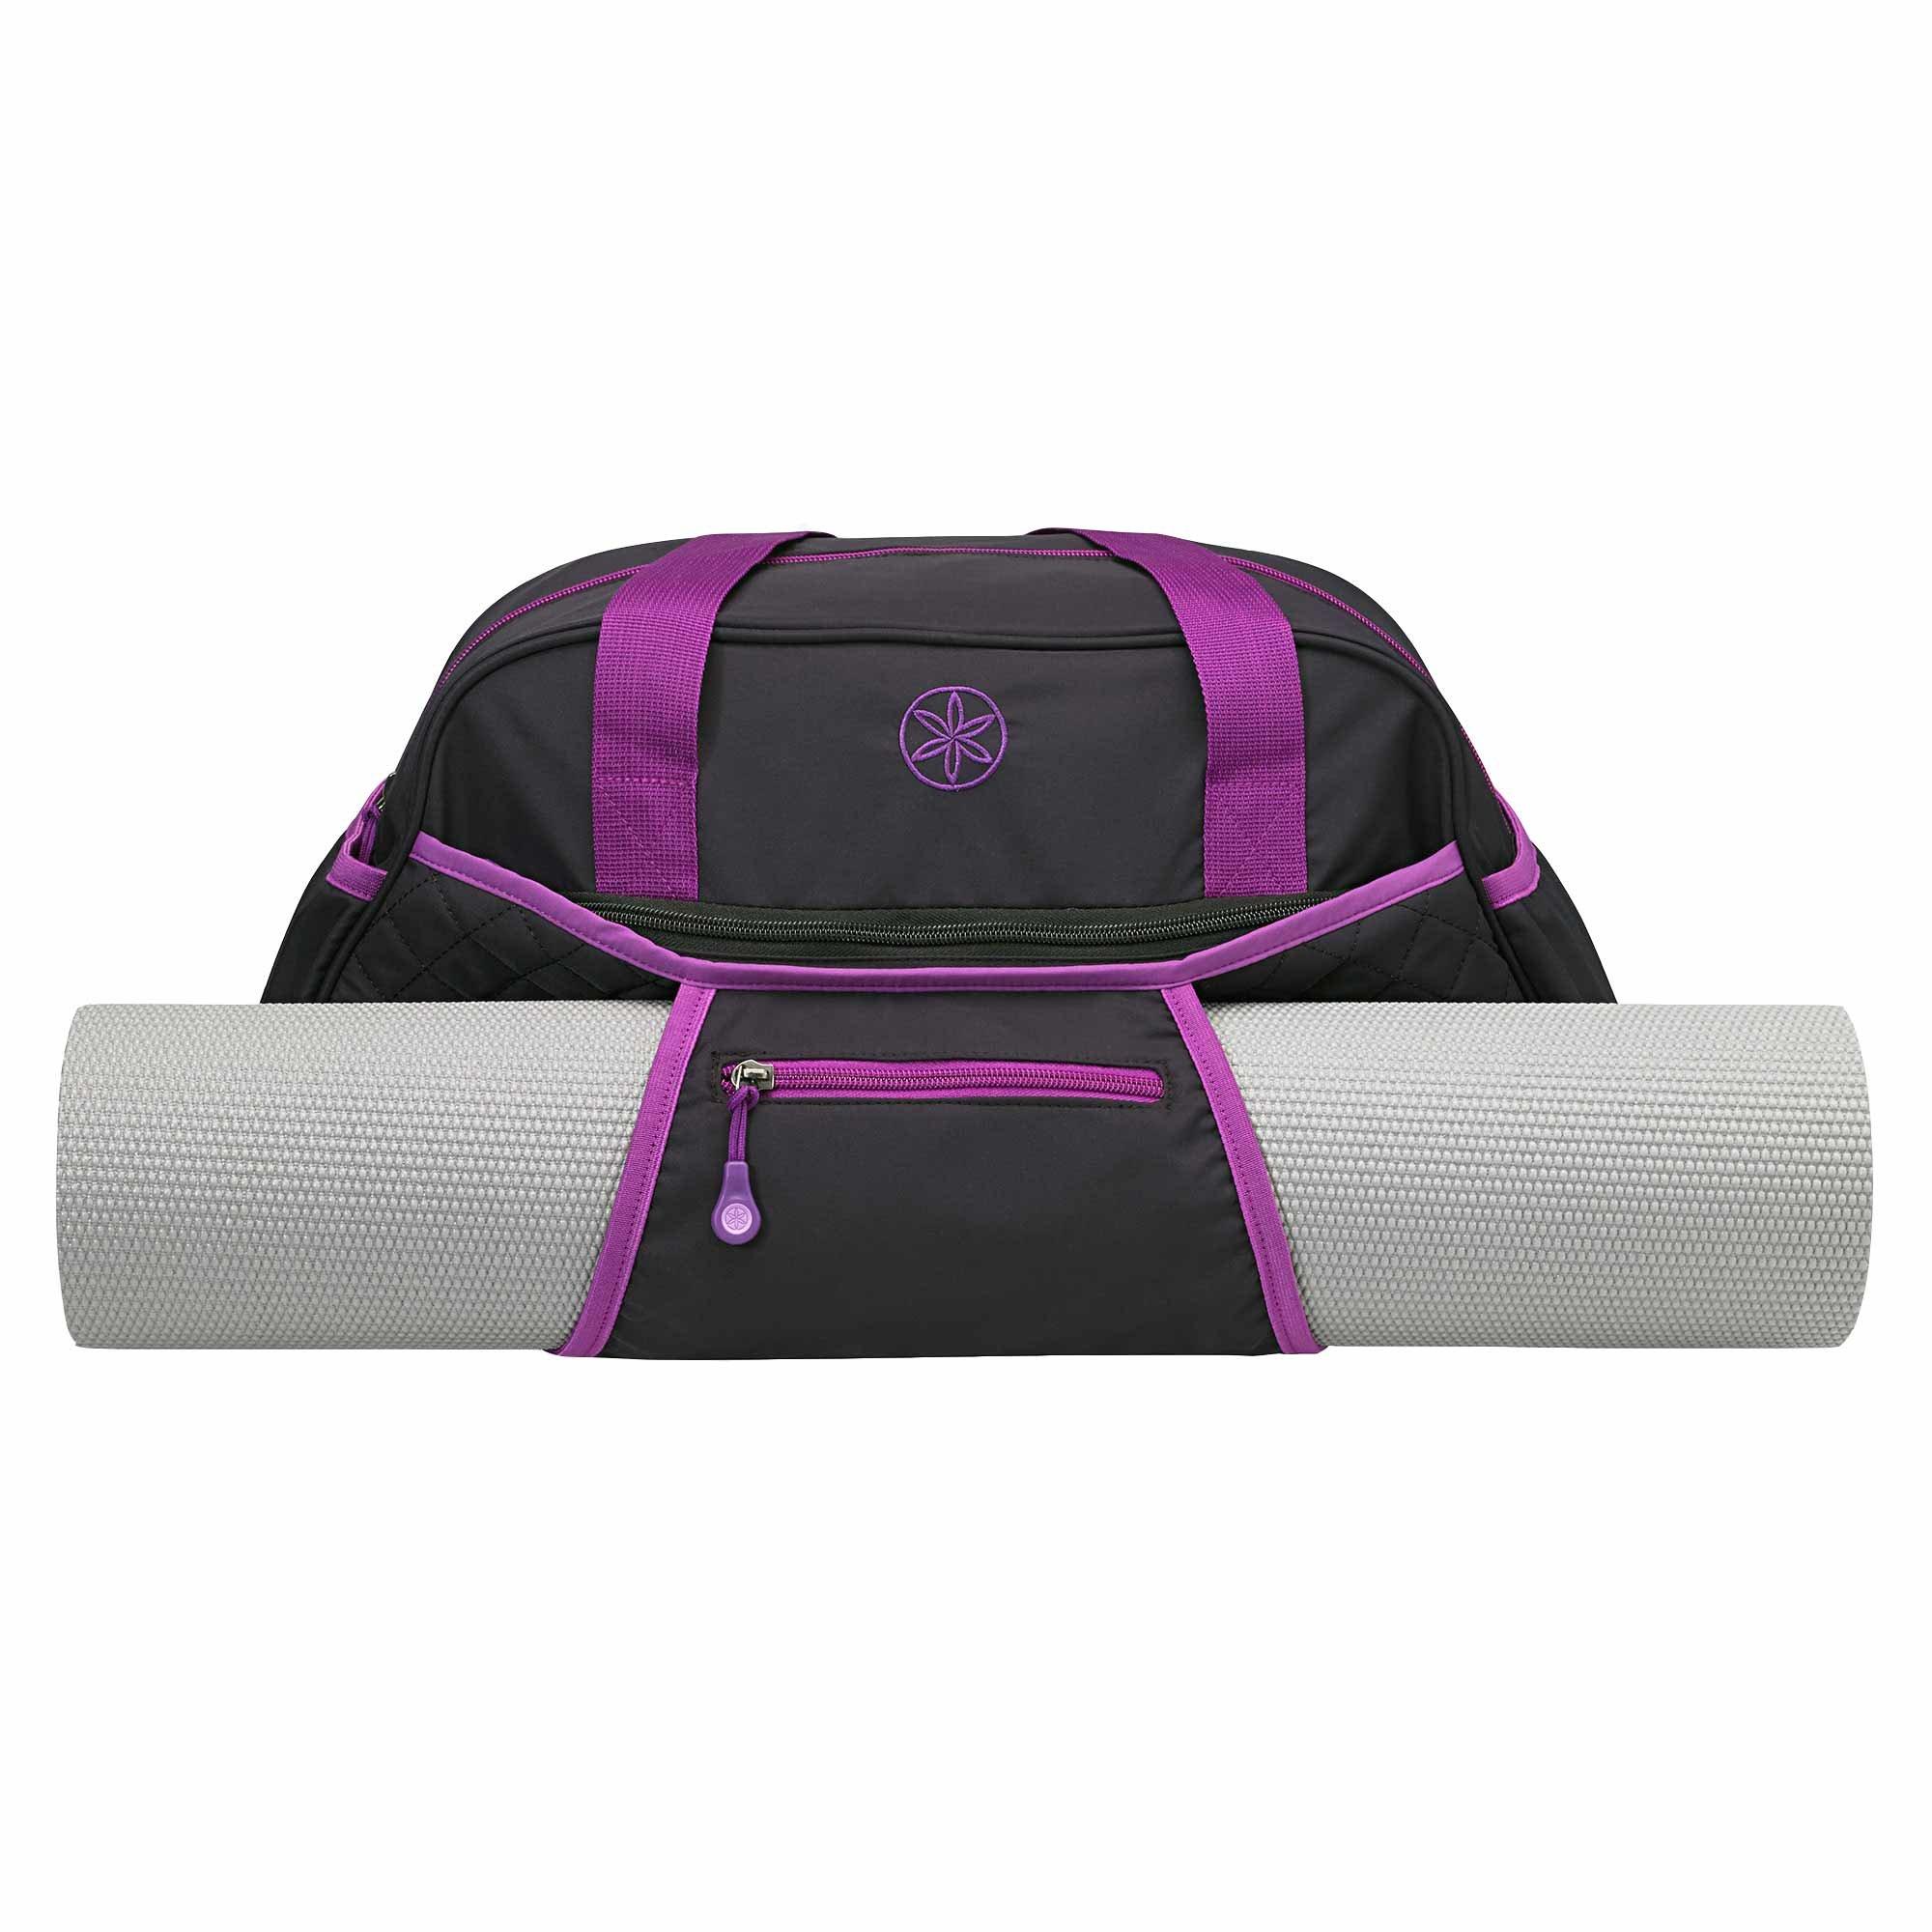 Yoga, Mats, Blocks, Straps, Bags, Clothing